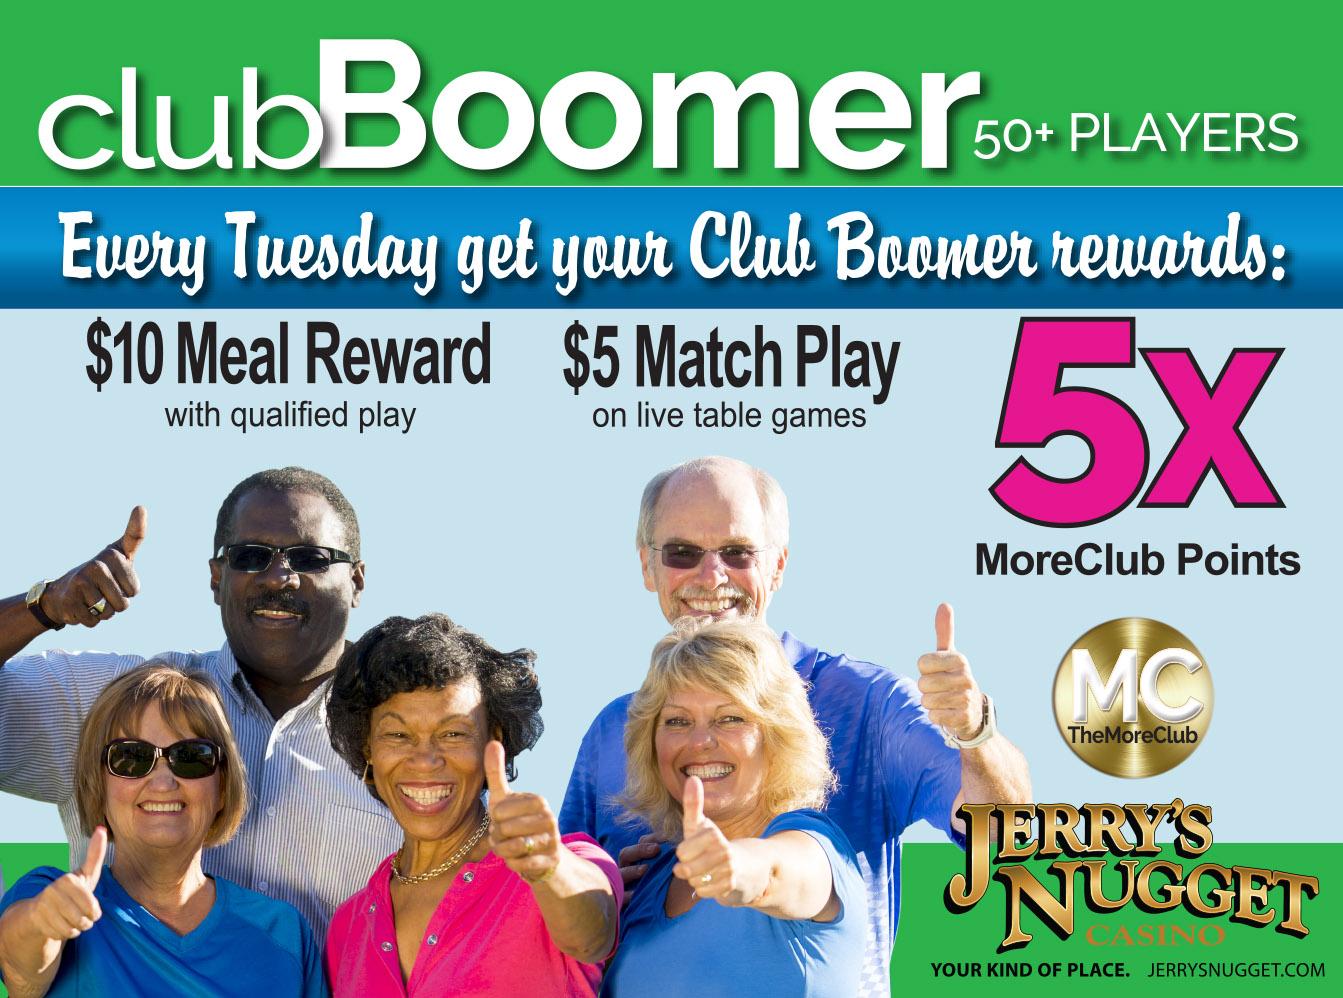 Club Boomer